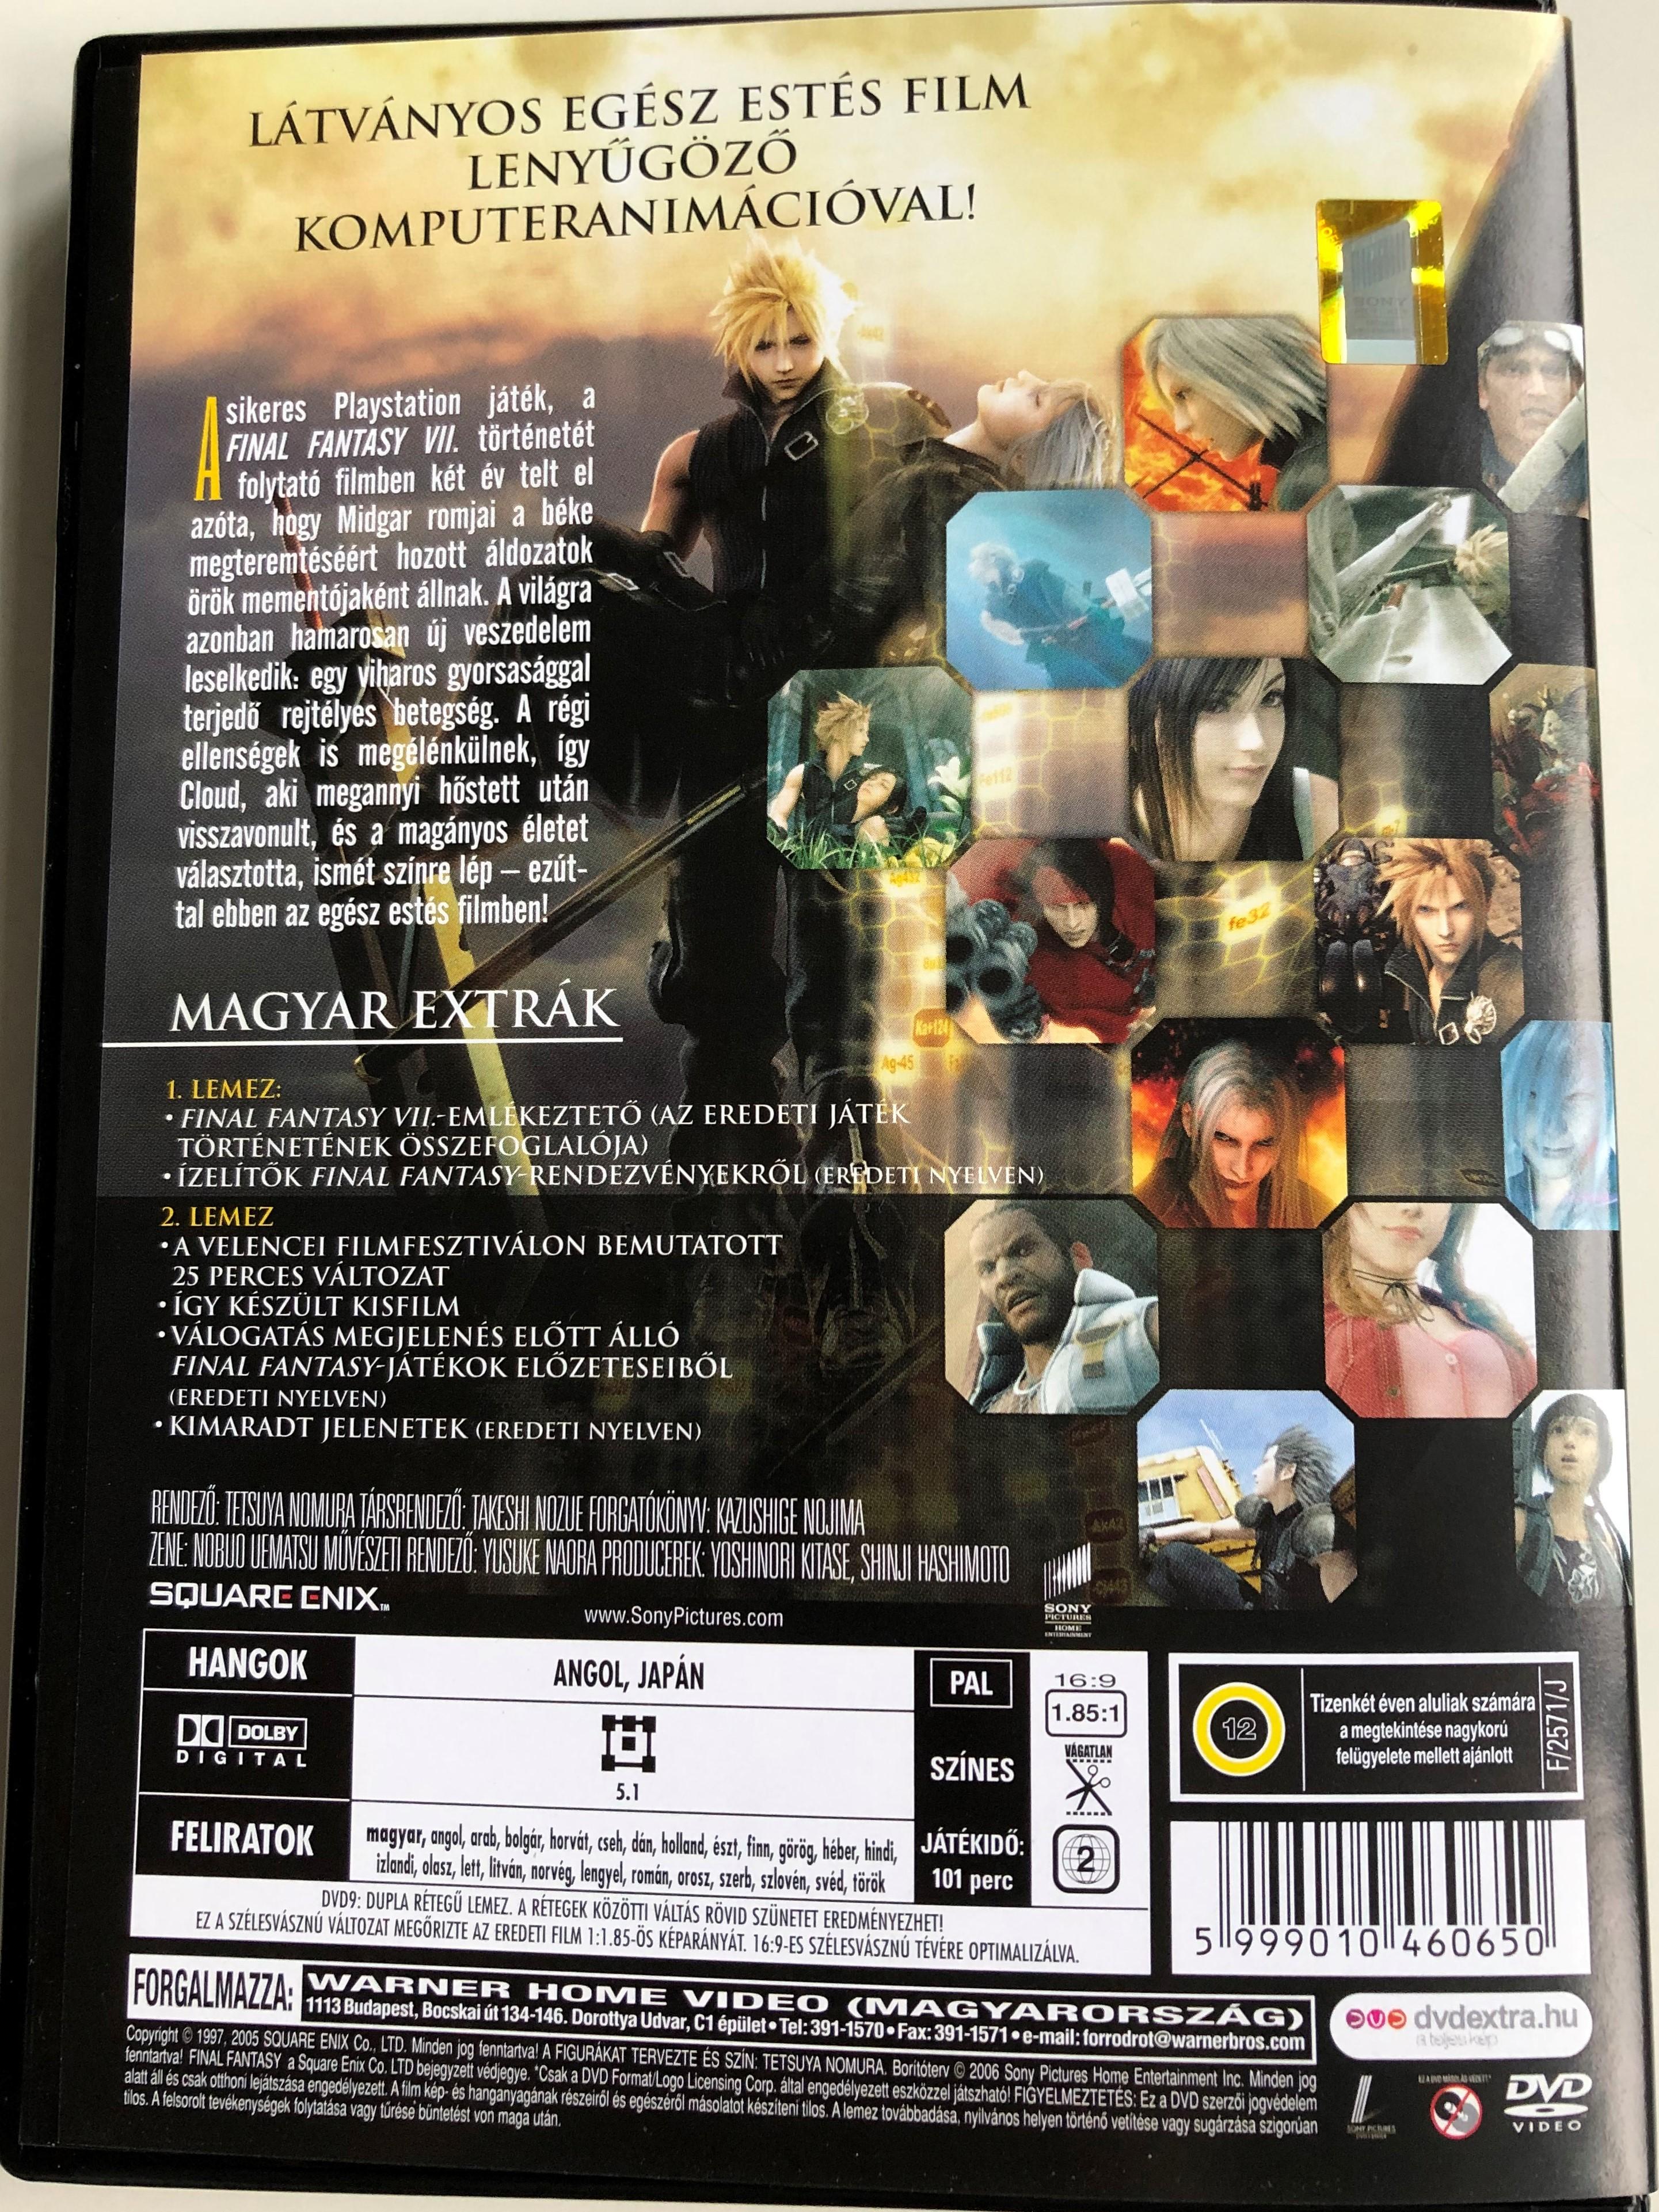 final-fantasy-vii-advent-children-dvd-cloud-visszat-r-duplalemezes-extra-v-ltozat-directed-by-tetsuya-nomura-3.jpg